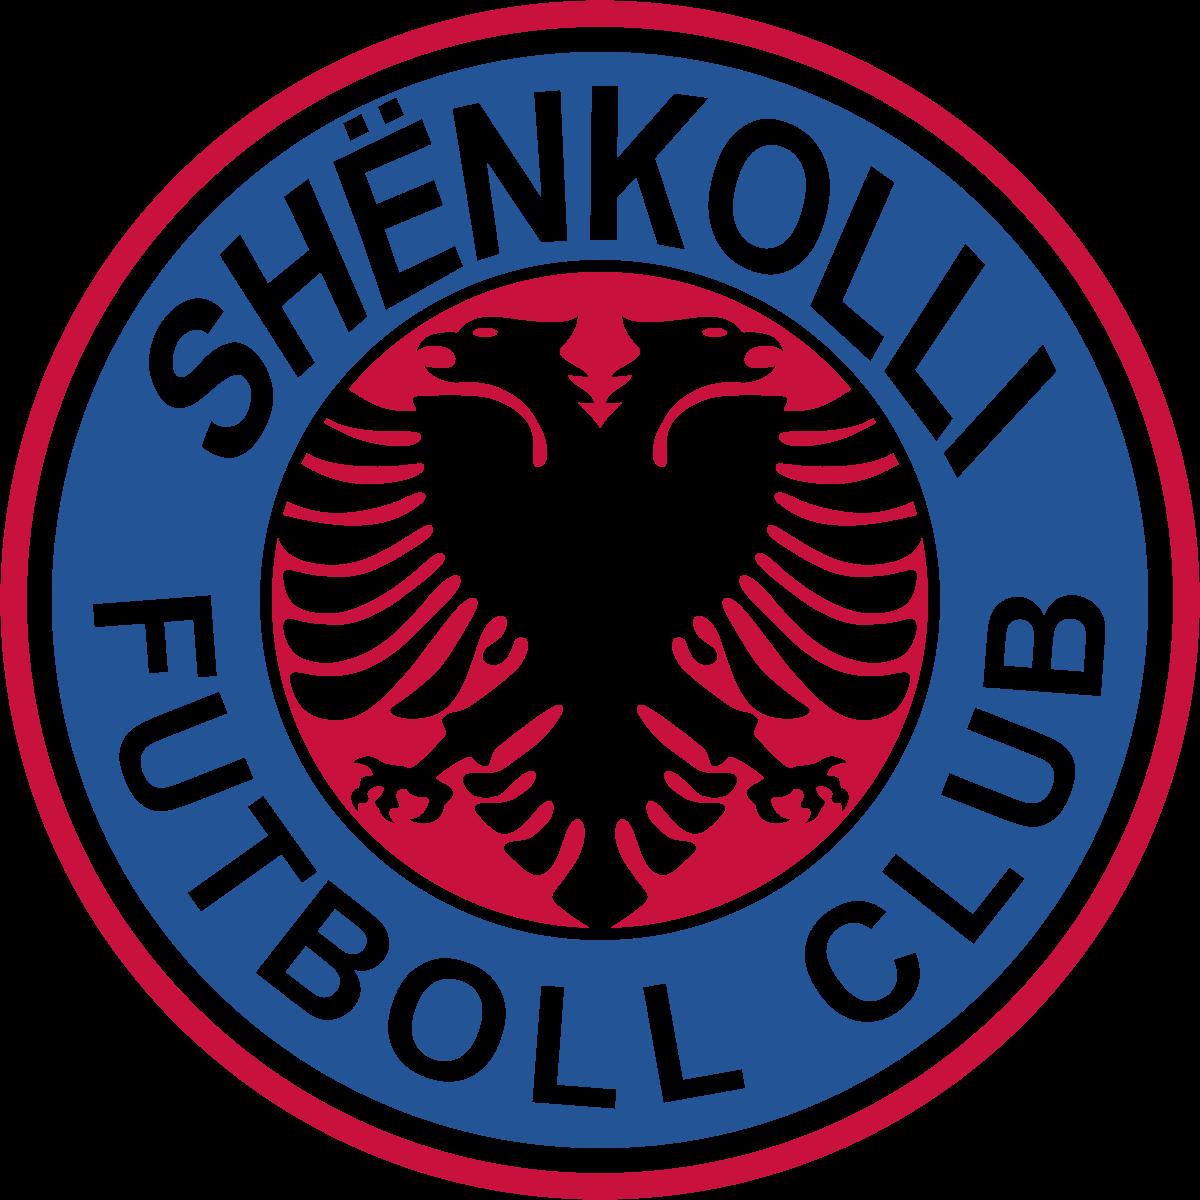 Shenkolli logo